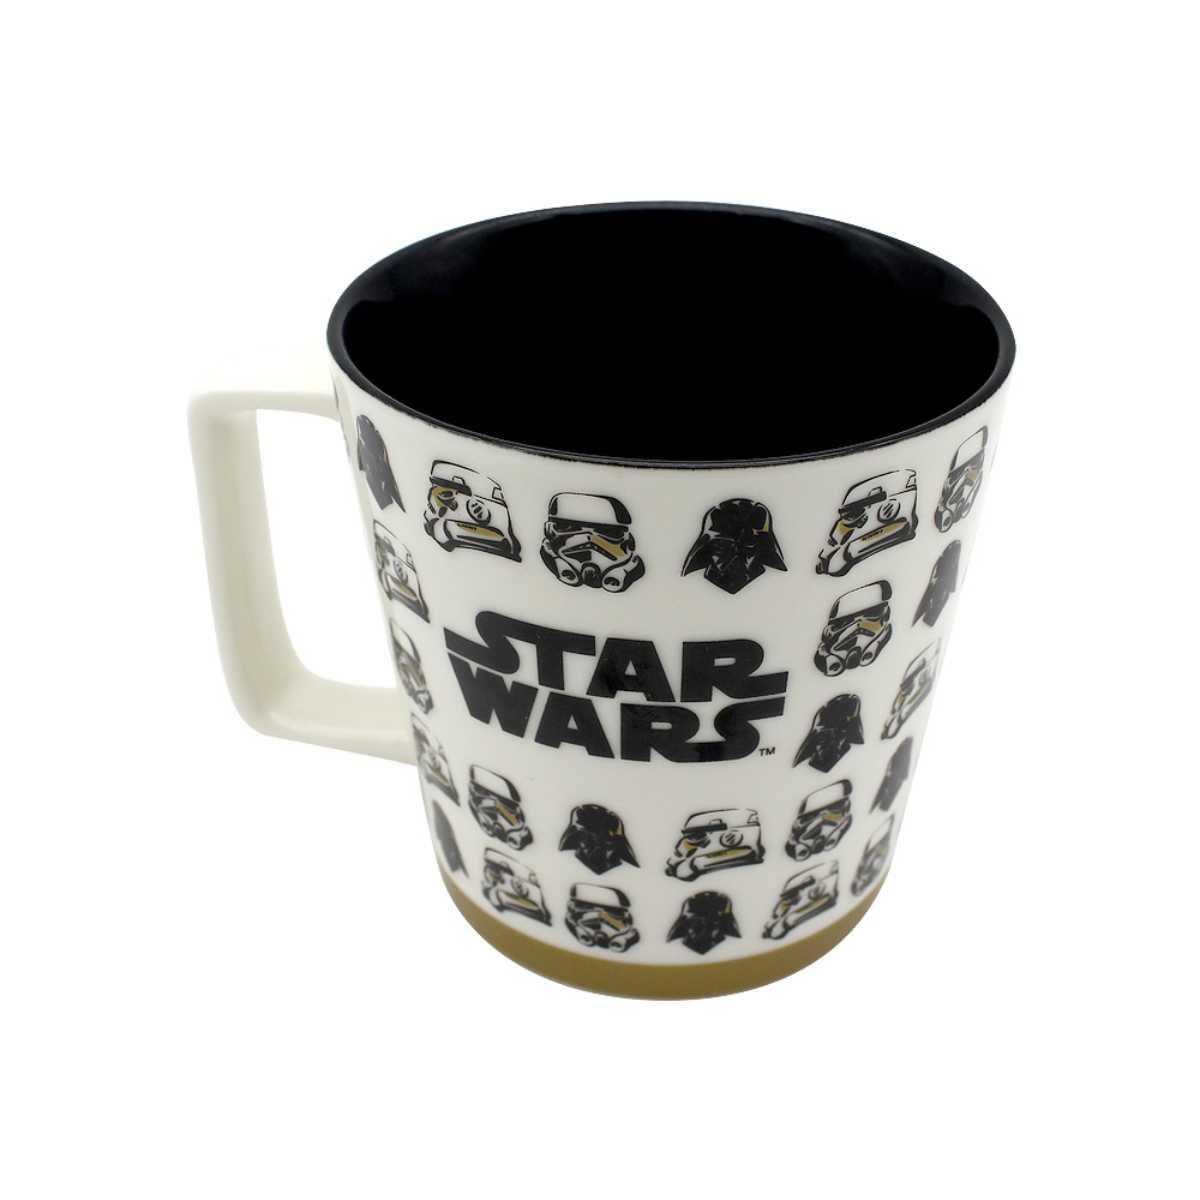 Caneca Alça Quadrada 400 ml Stormtroopers Star Wars